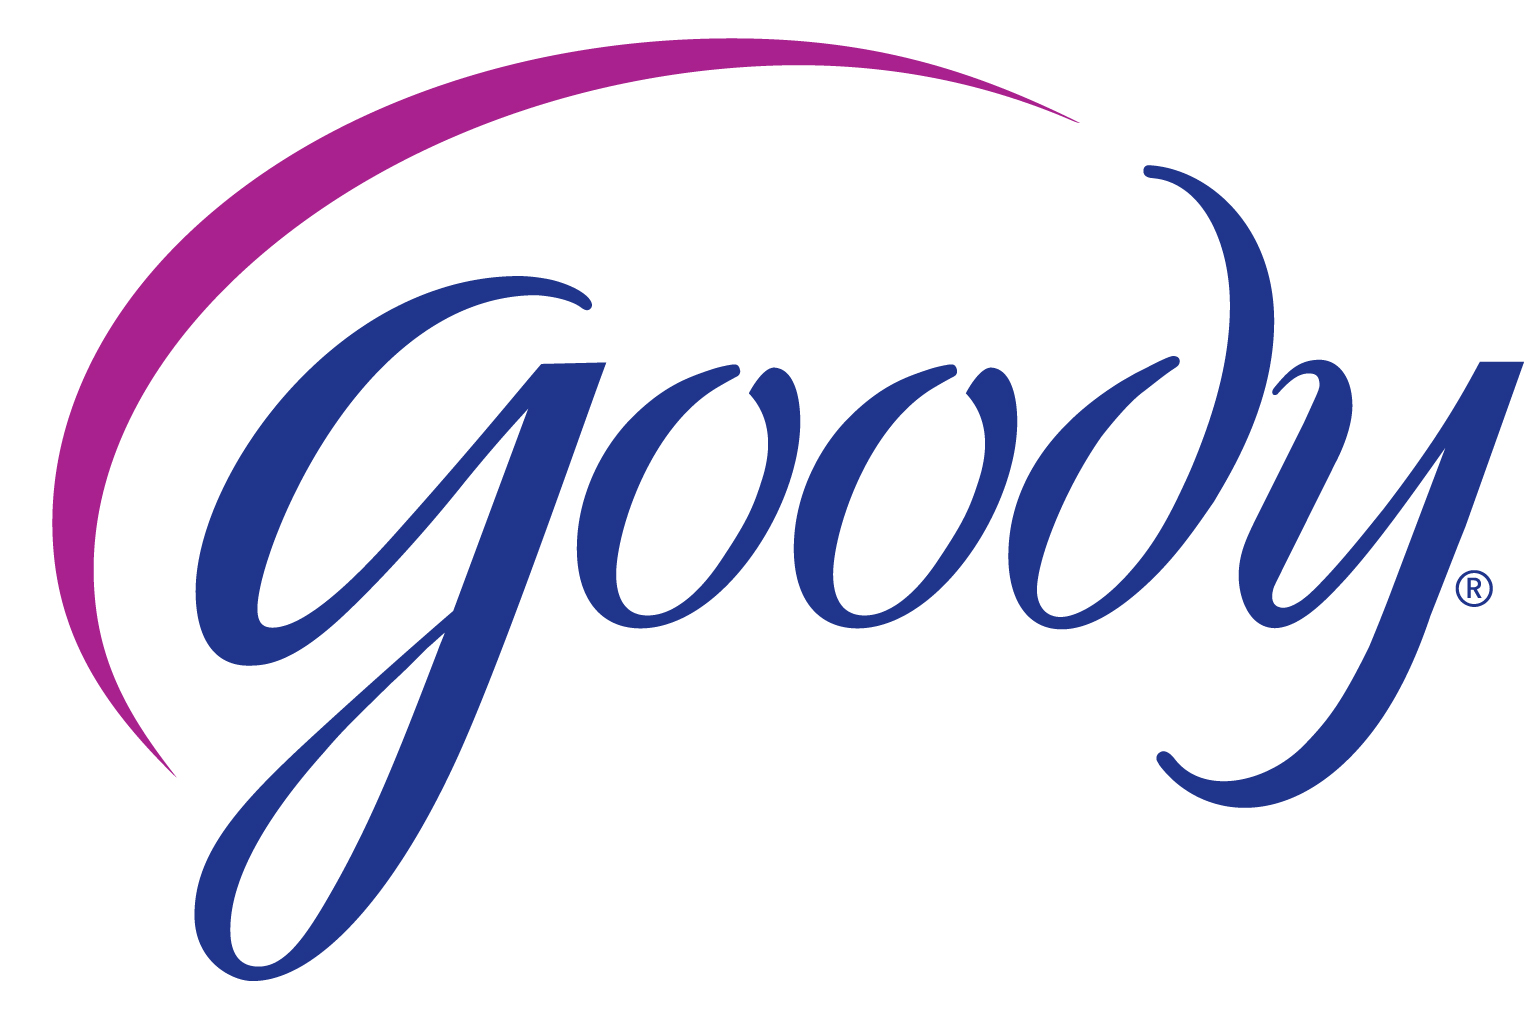 hair product logos joy studio design gallery best design